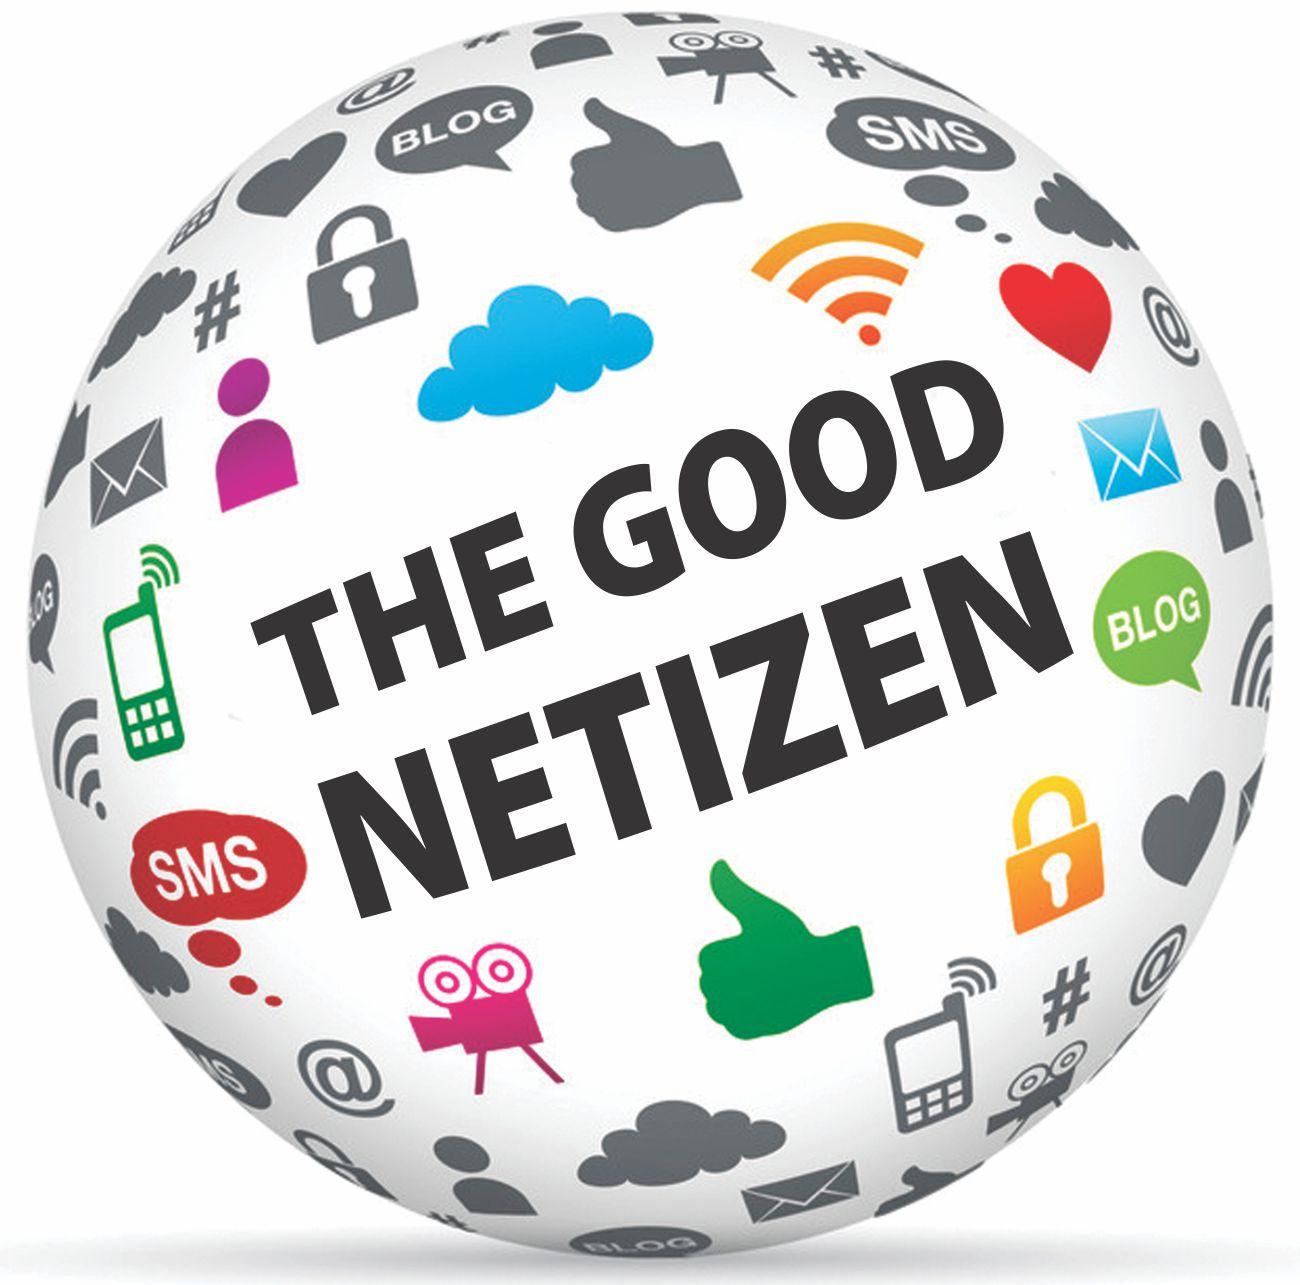 Netizen, Sursa: Computer education